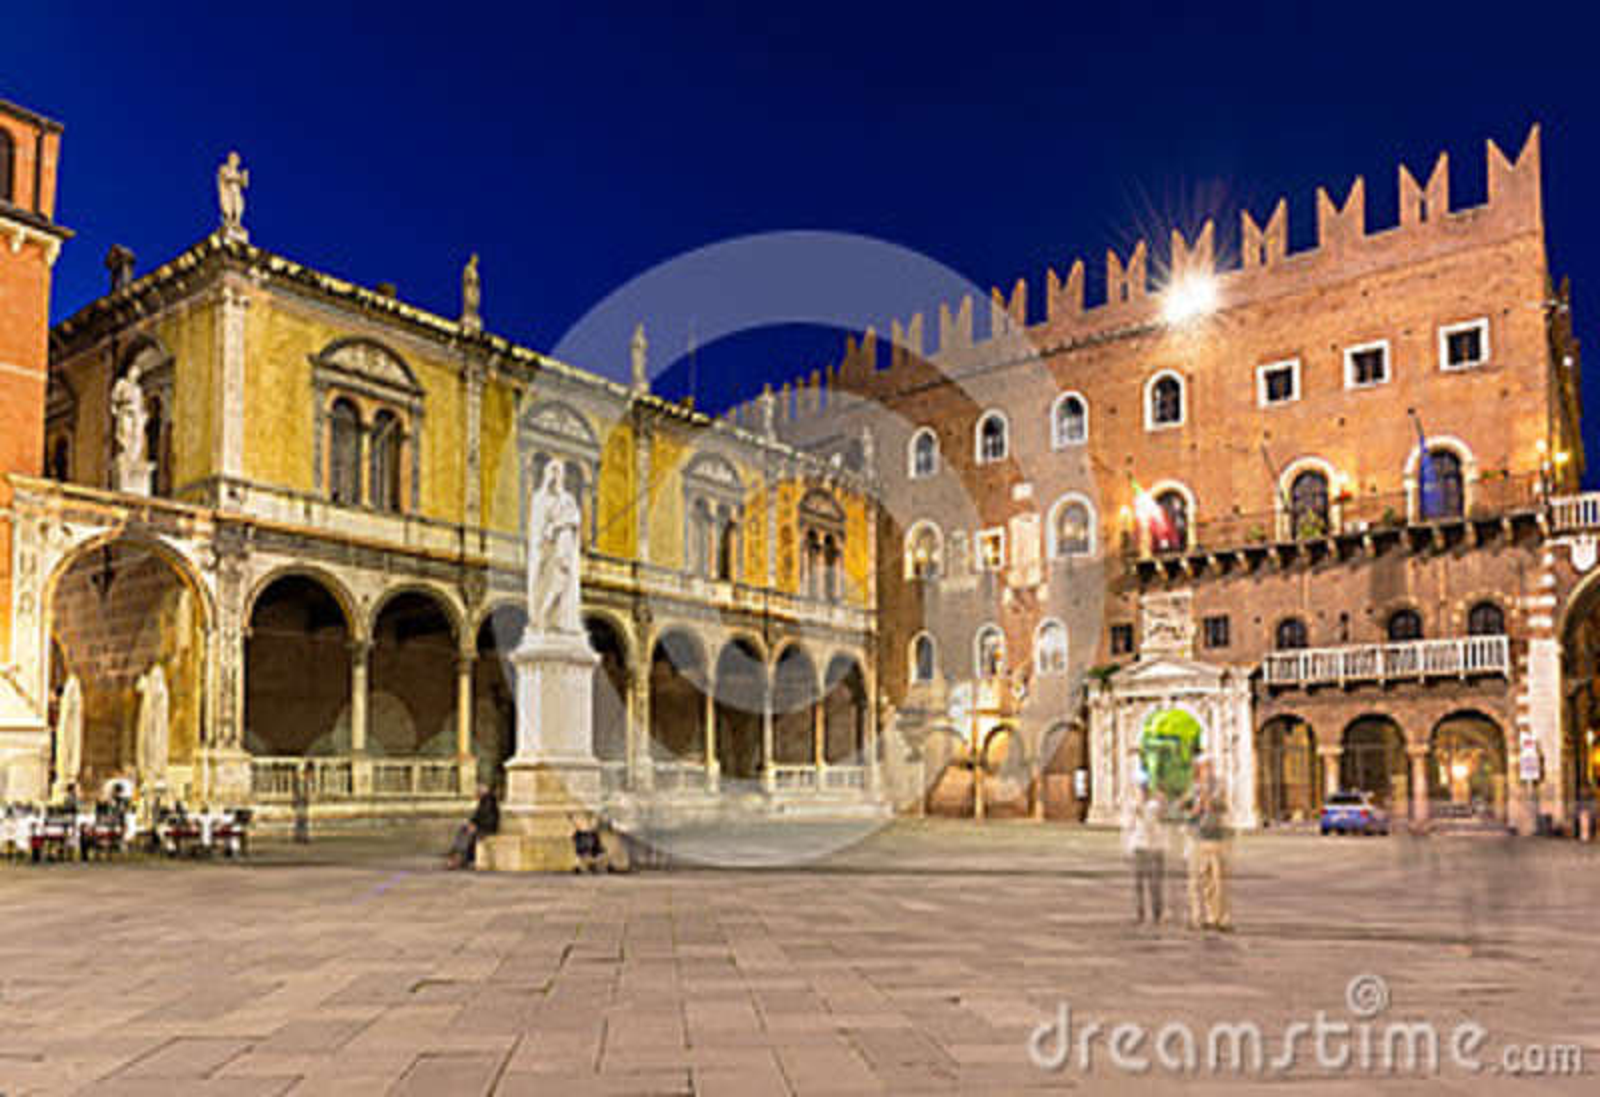 Signori dei аркады с статуей Dante в Вероне